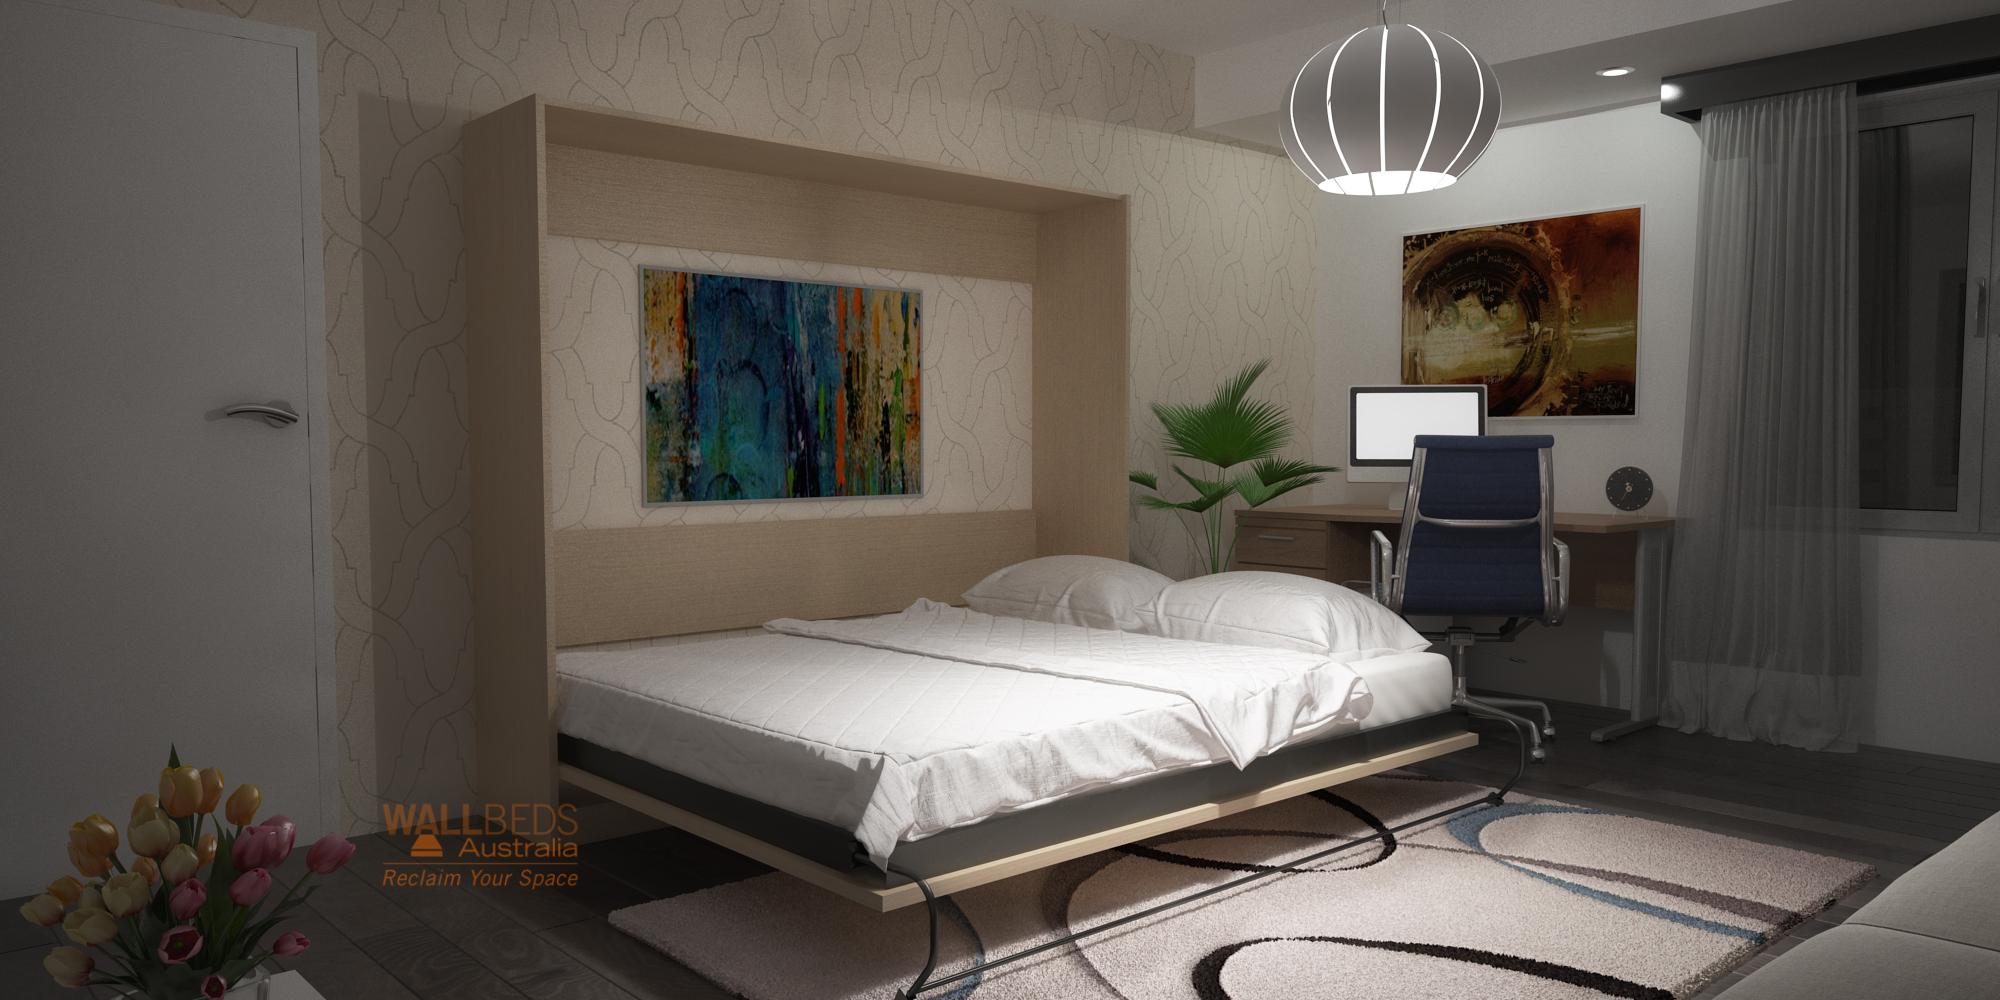 ALPHA Horizontal bed